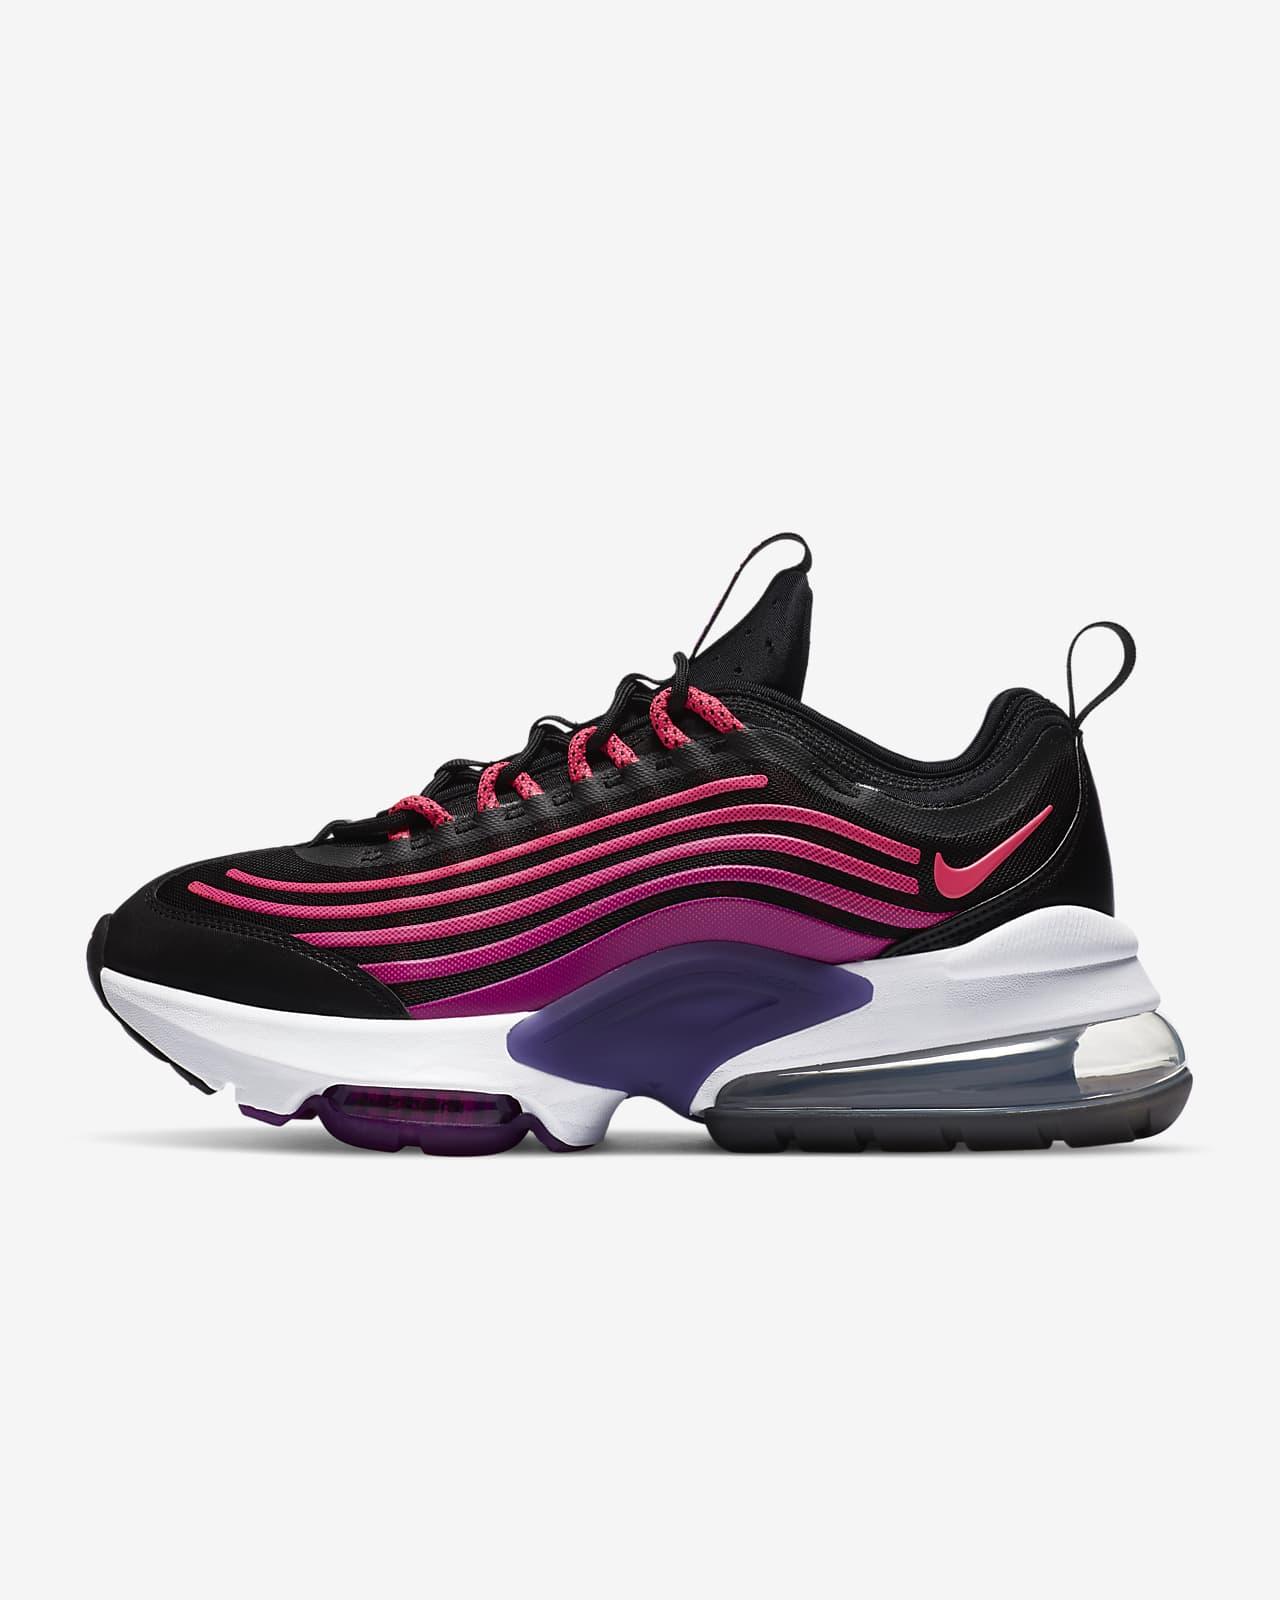 Nike Air Max ZM950 Women's Shoe